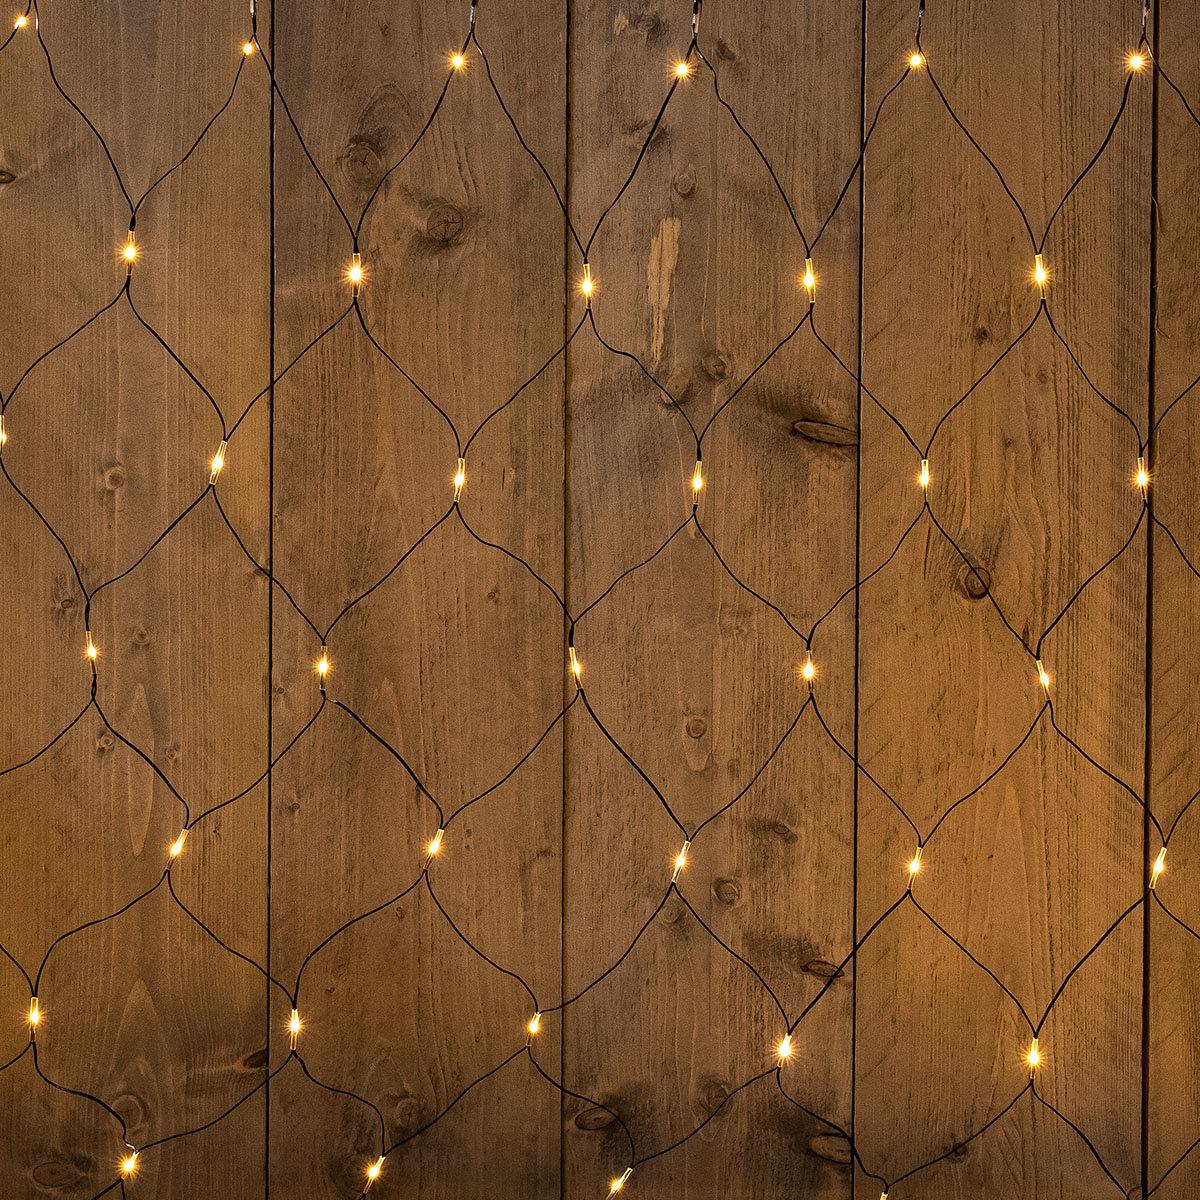 LED-Lichternetz, 240 LEDs, 200x200 cm, weiß   #2